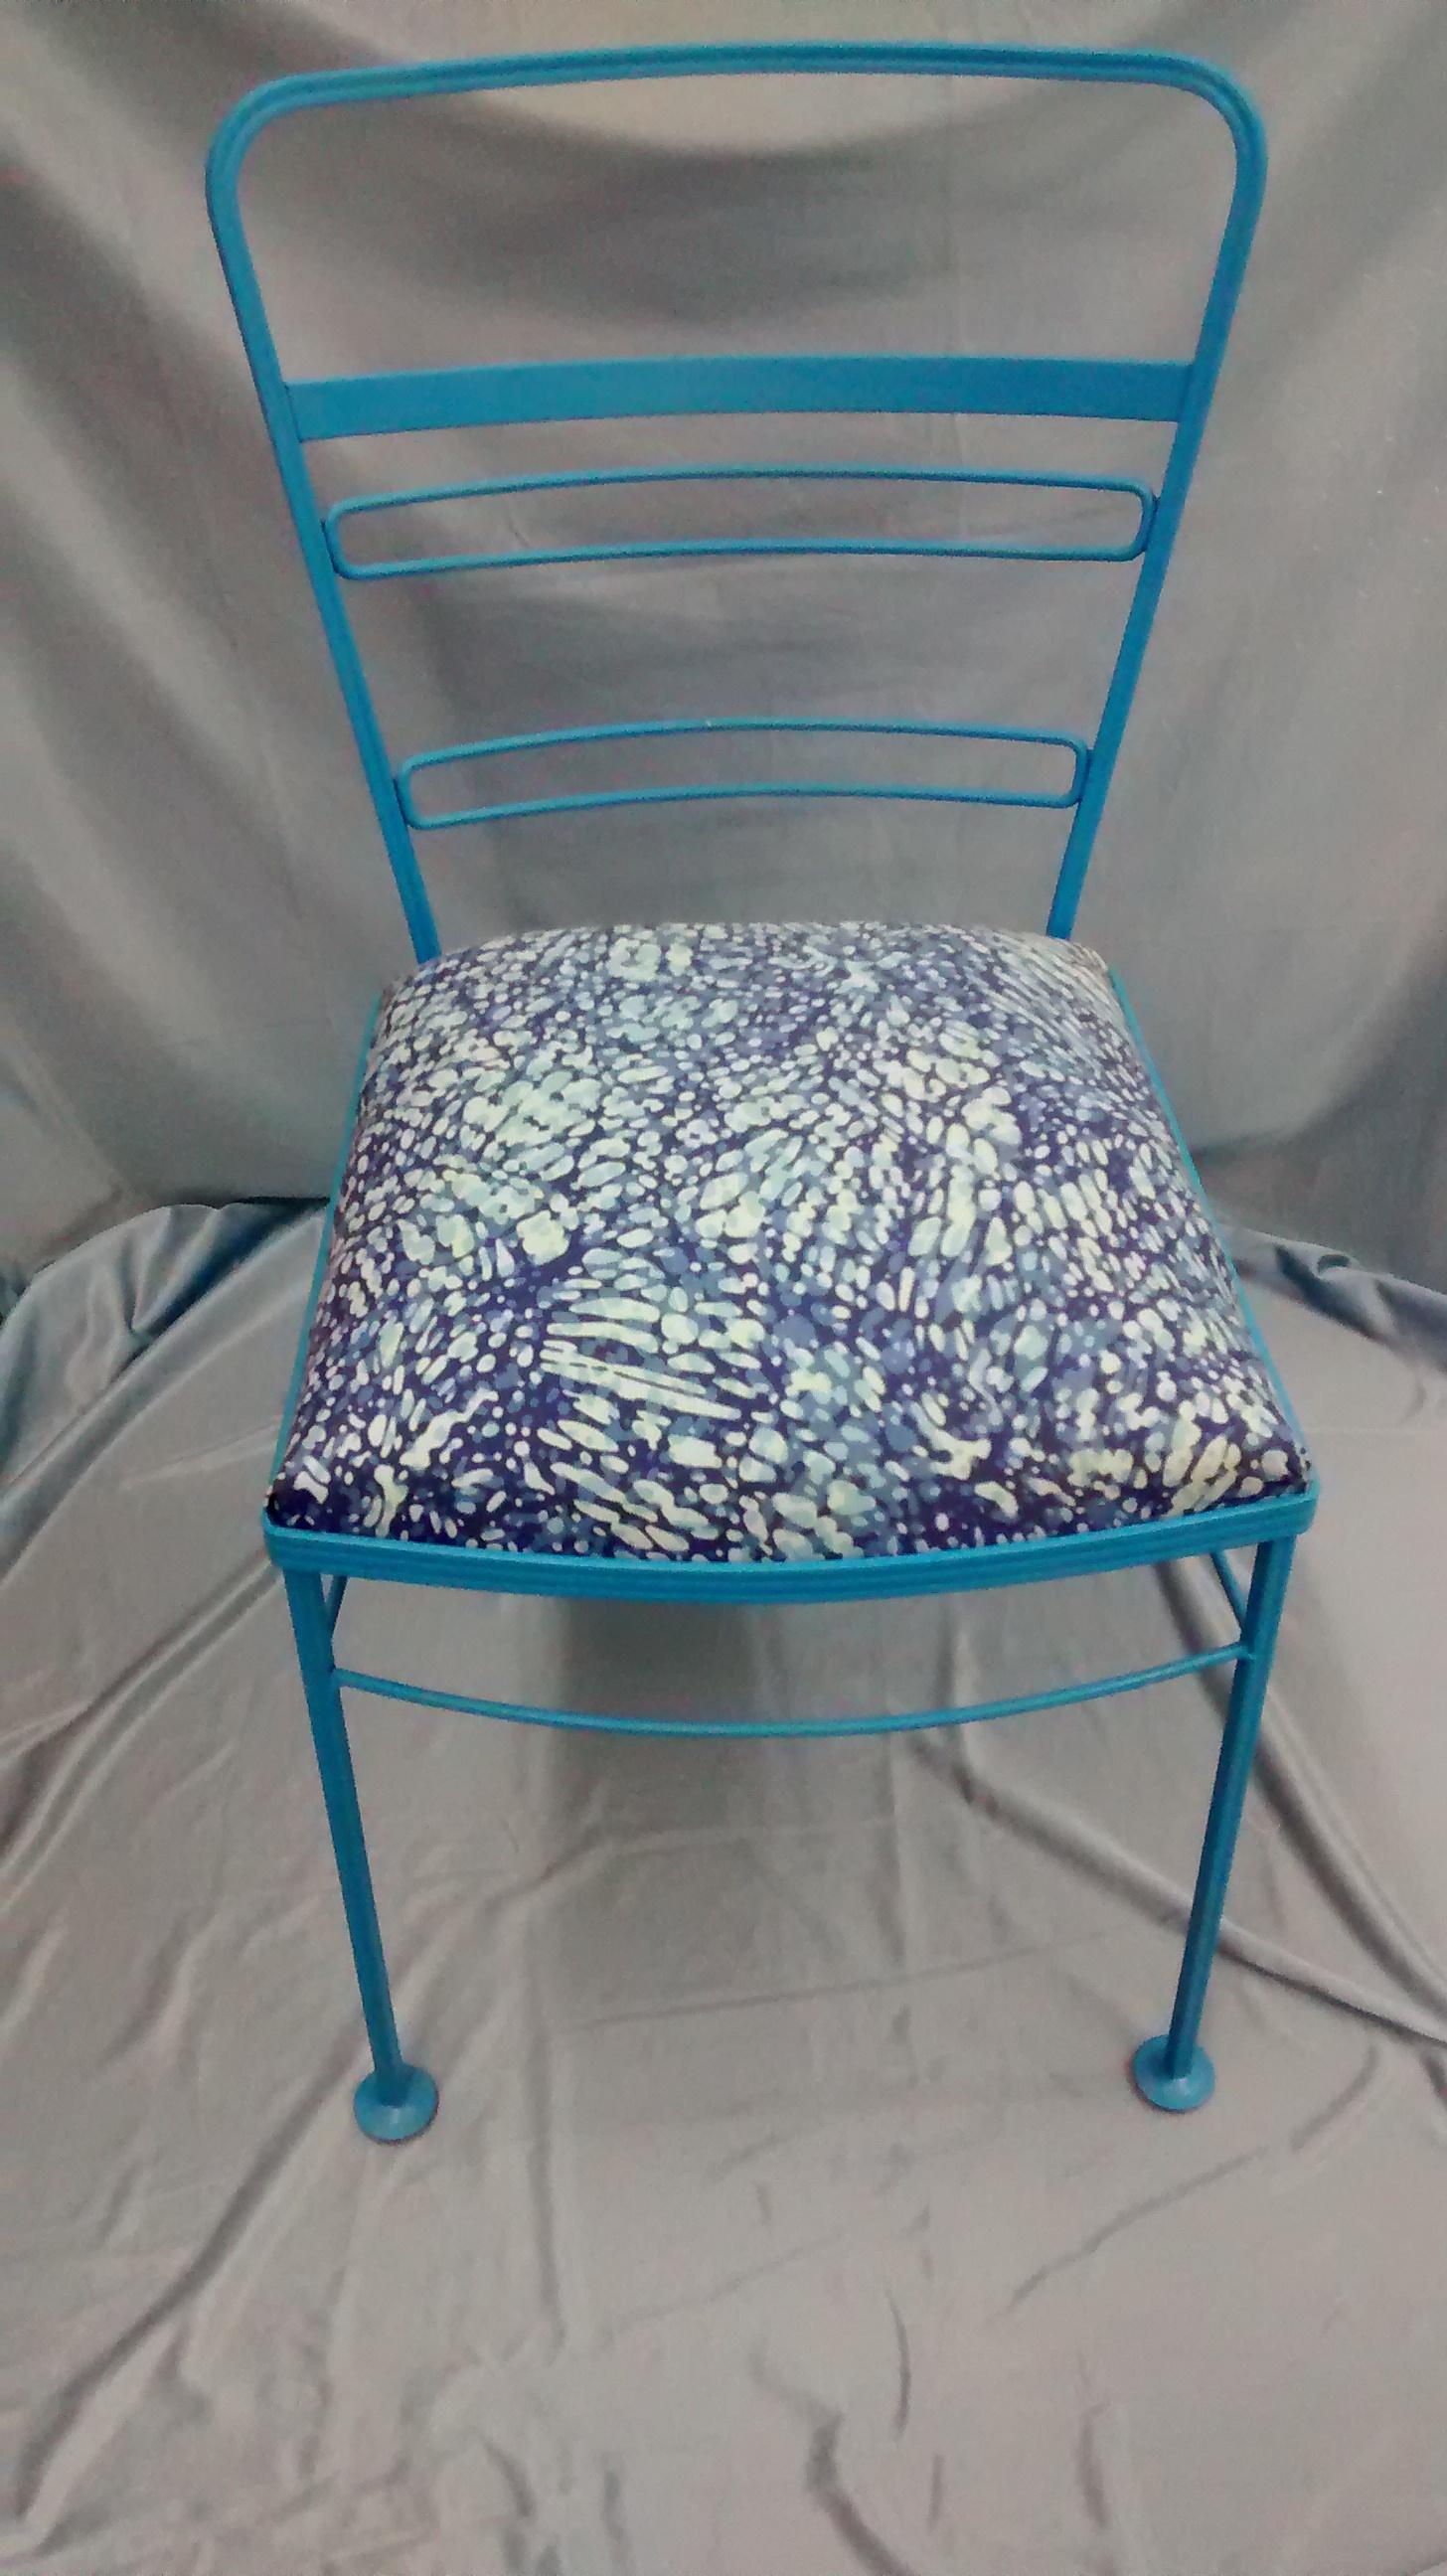 Aqua Blue Metal Chair with New Comfy Cushion